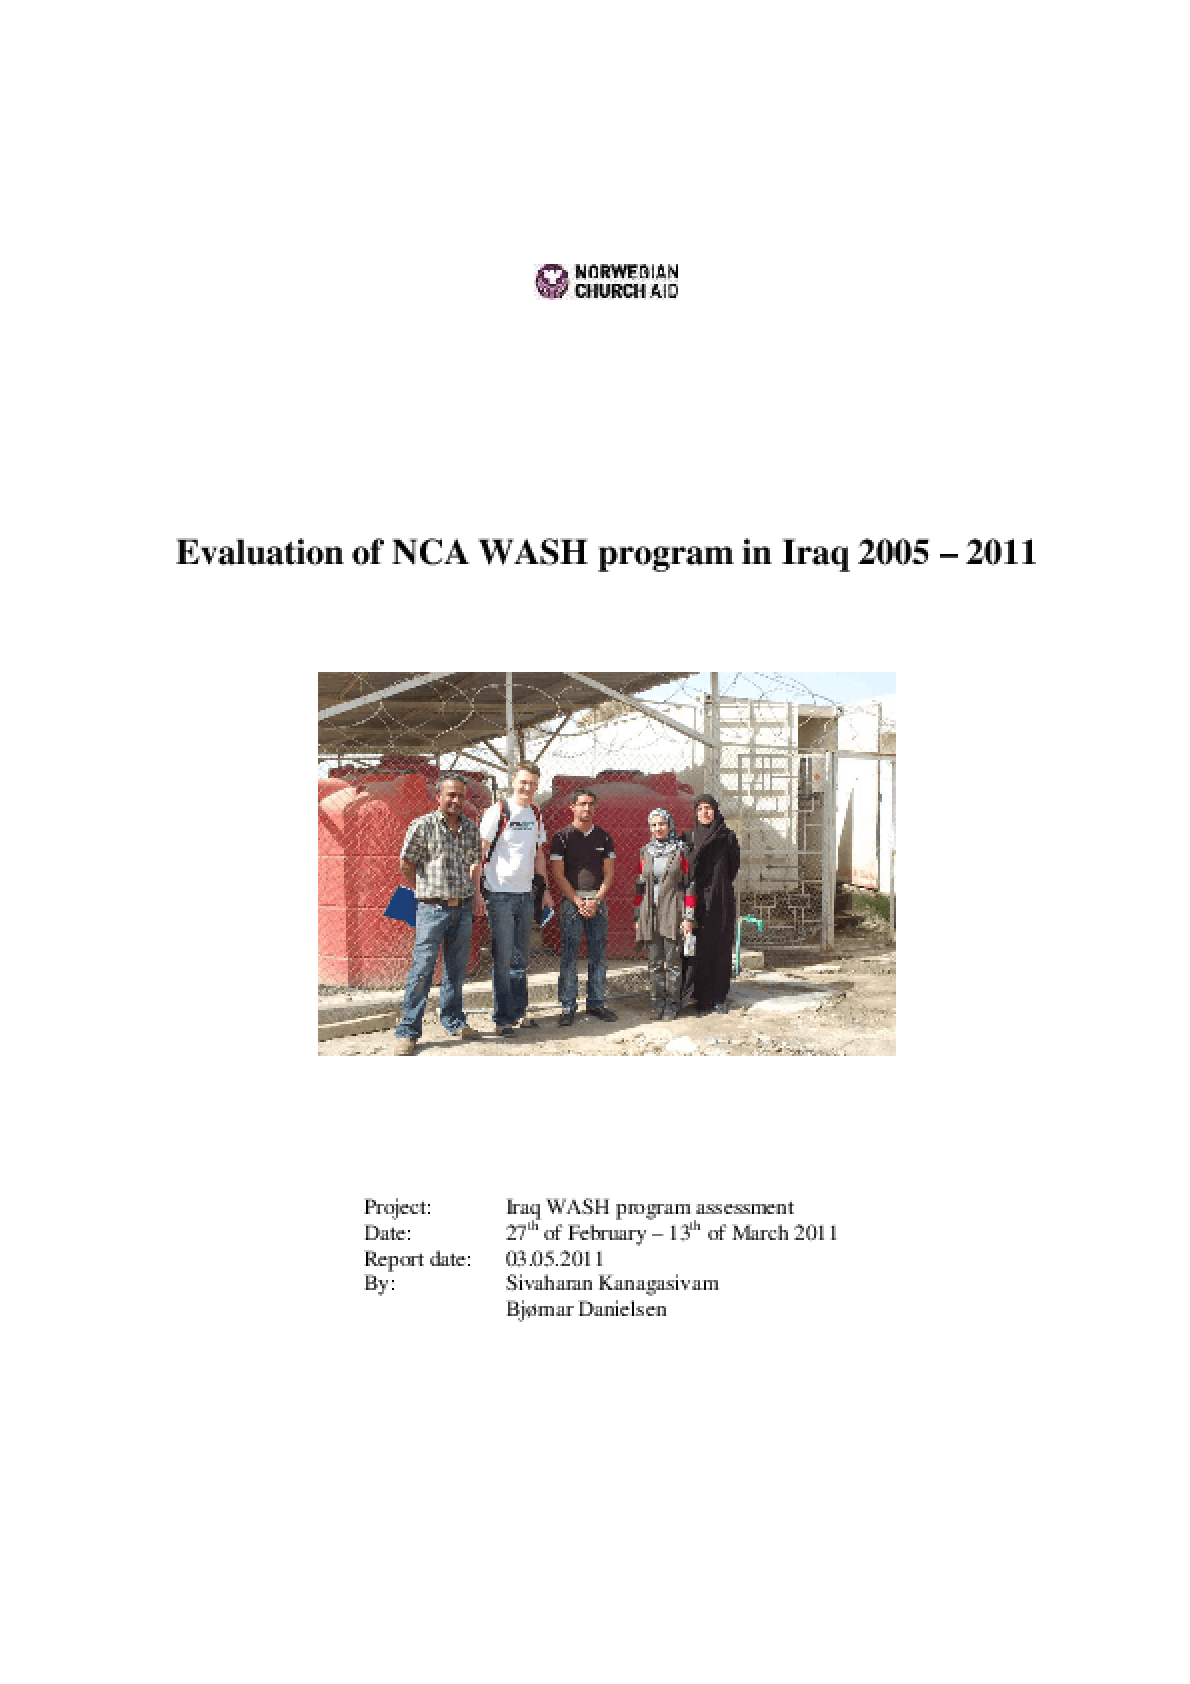 Evaluation of NCA WASH Program in Iraq, 2005-2011